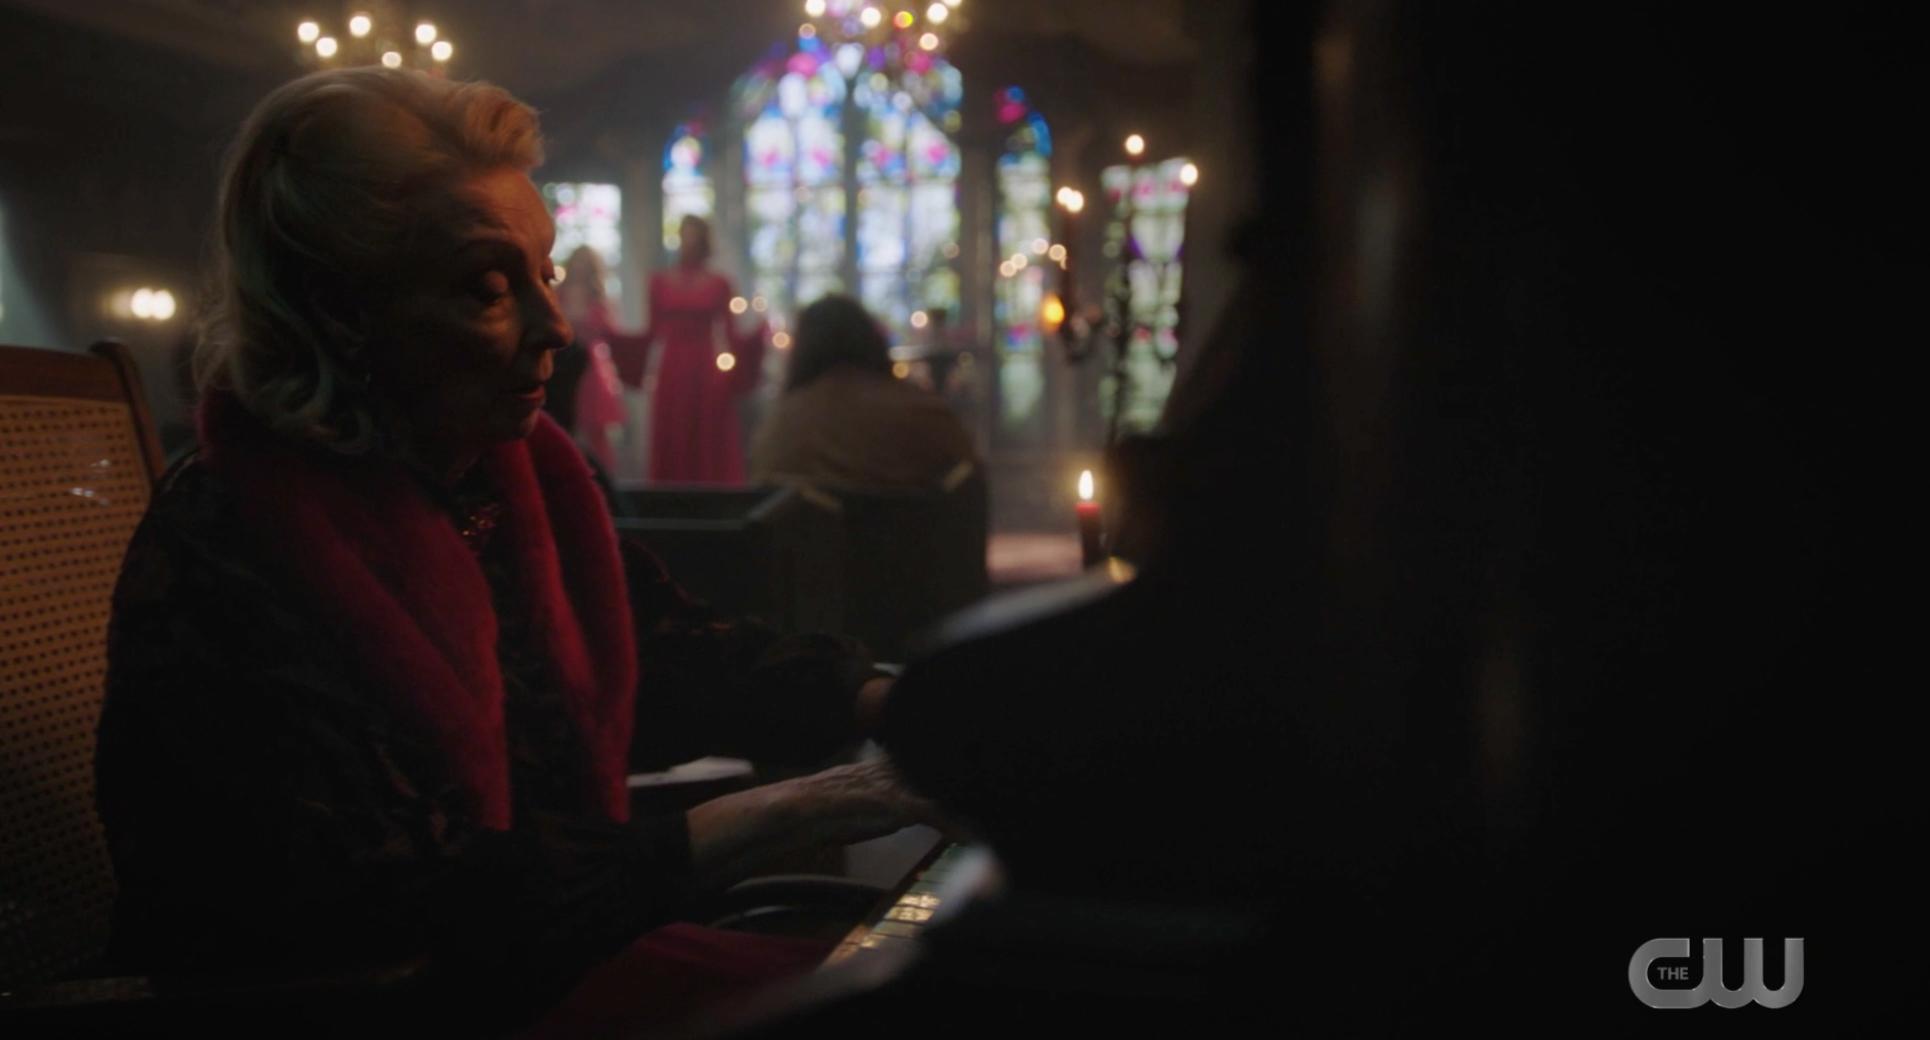 Nana rose playing piano